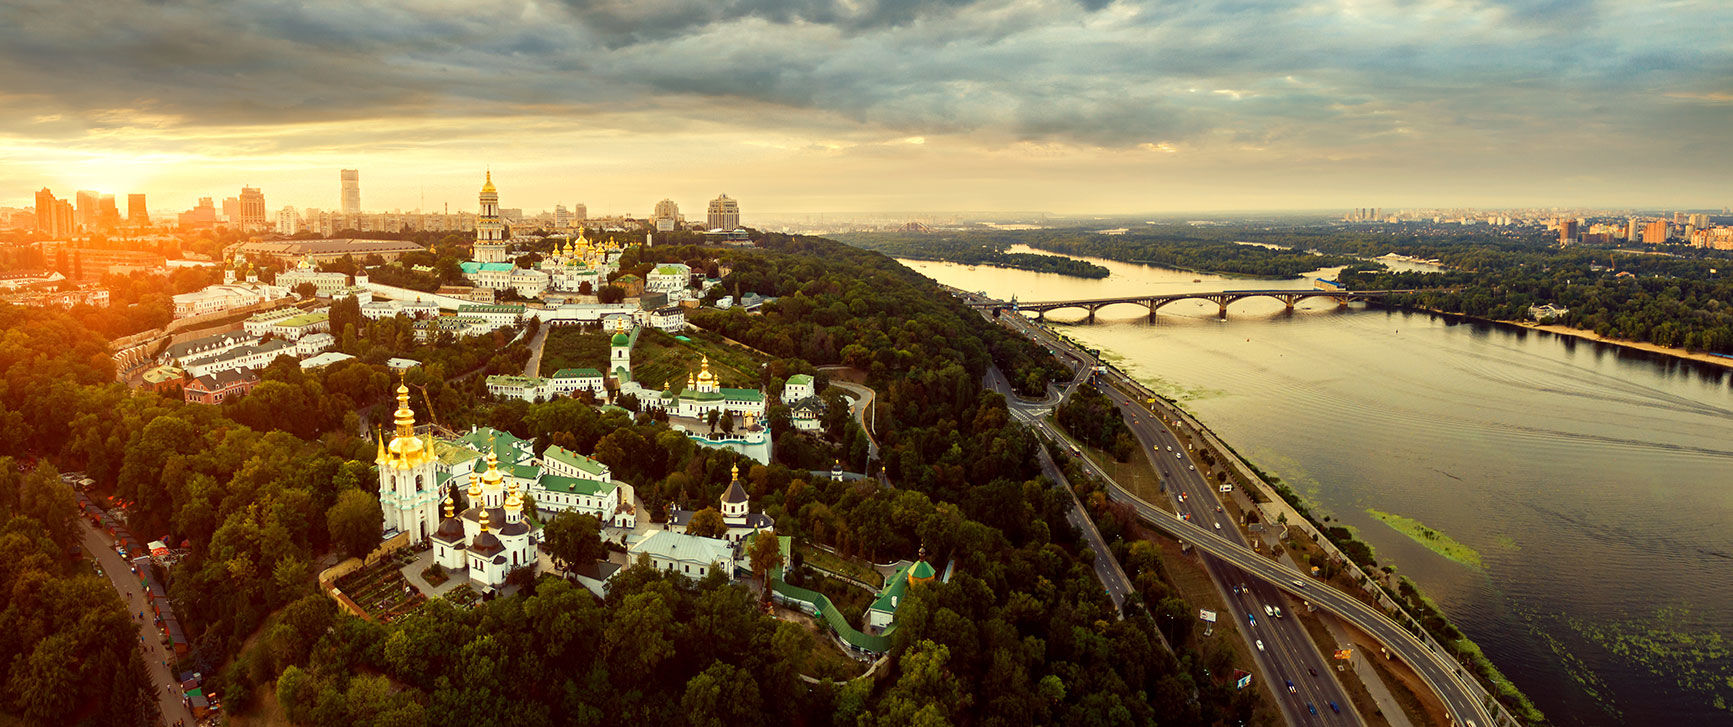 Kyjev. seregalsv | istockphoto.com/